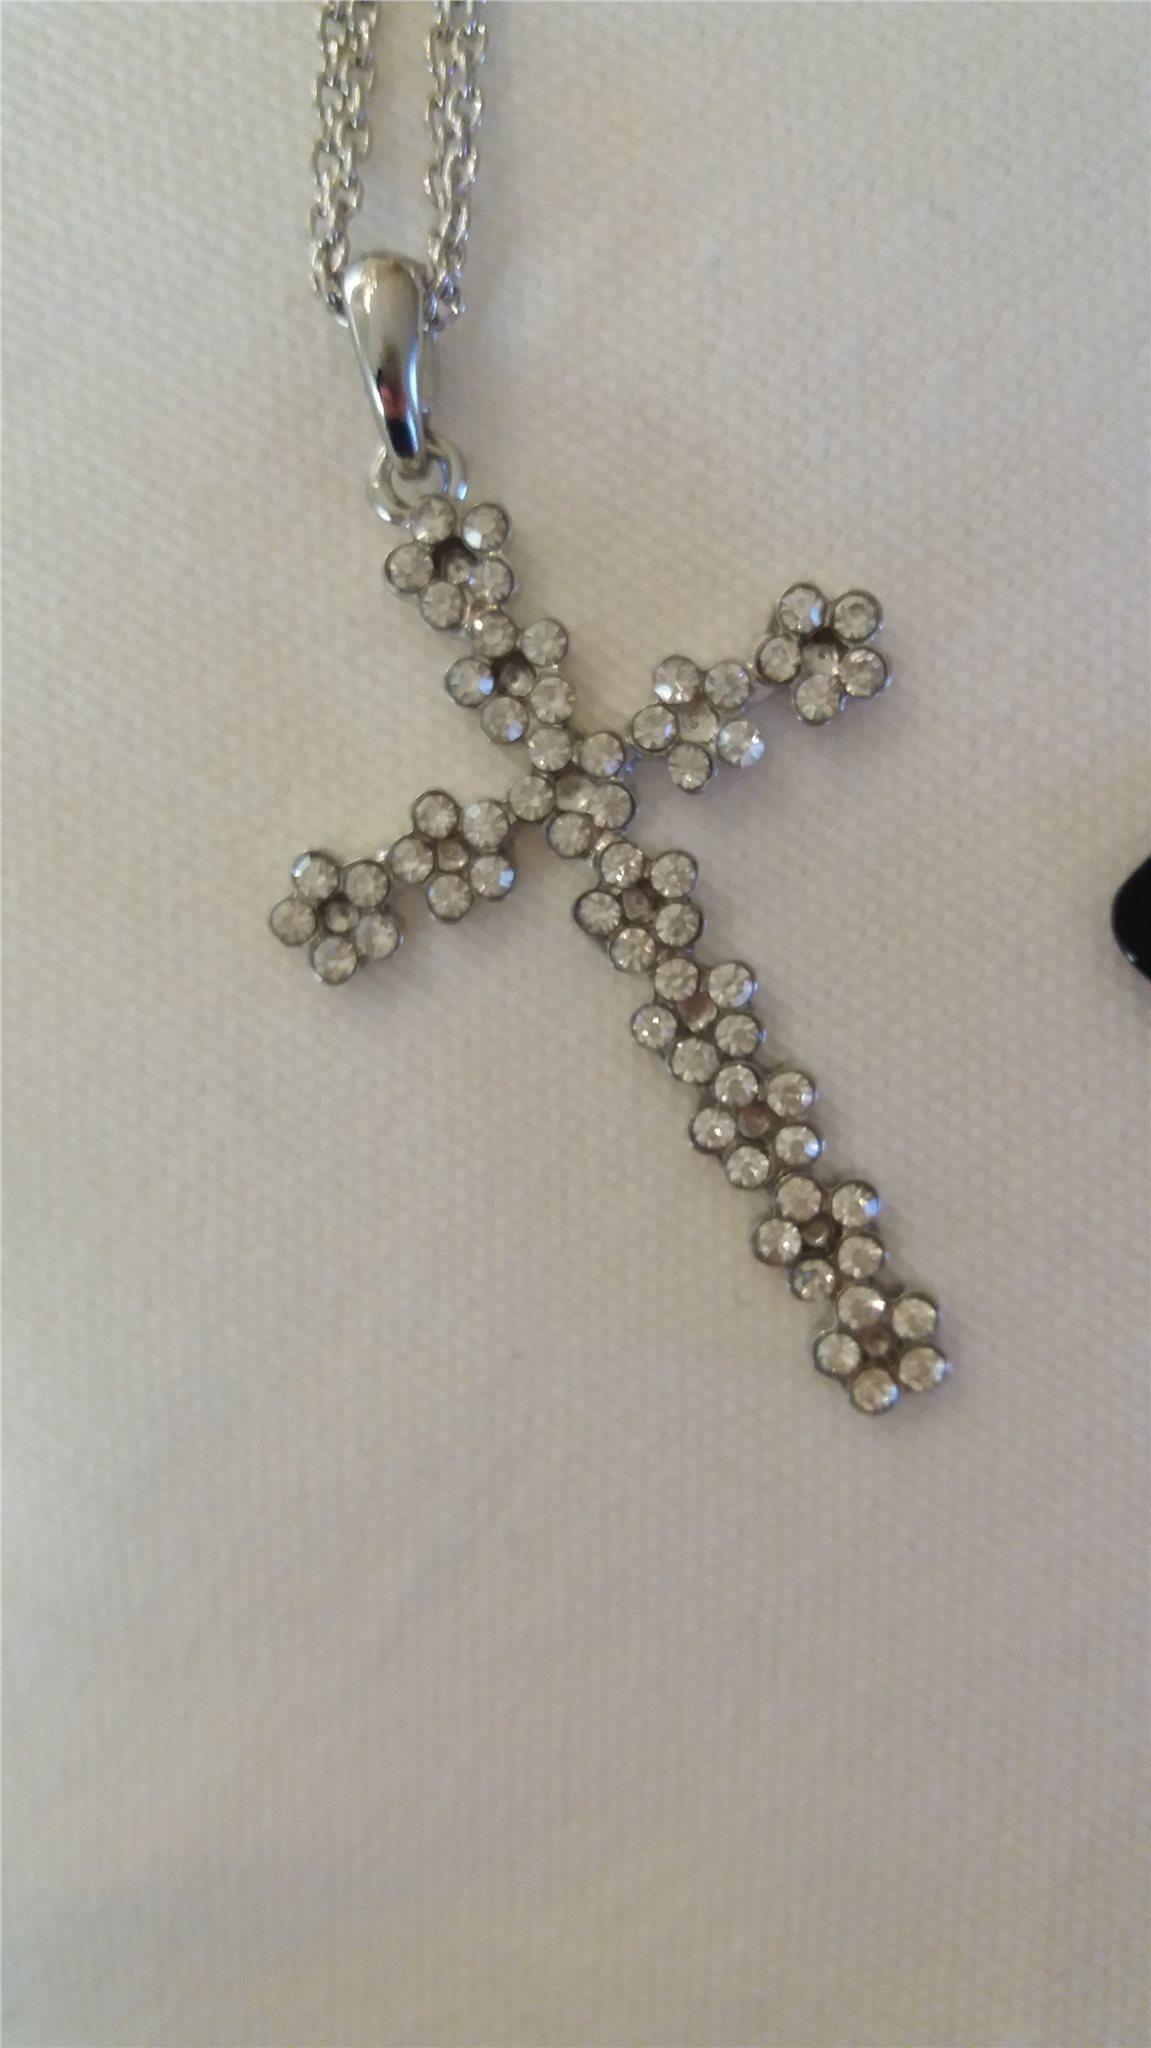 kors halsband glitter